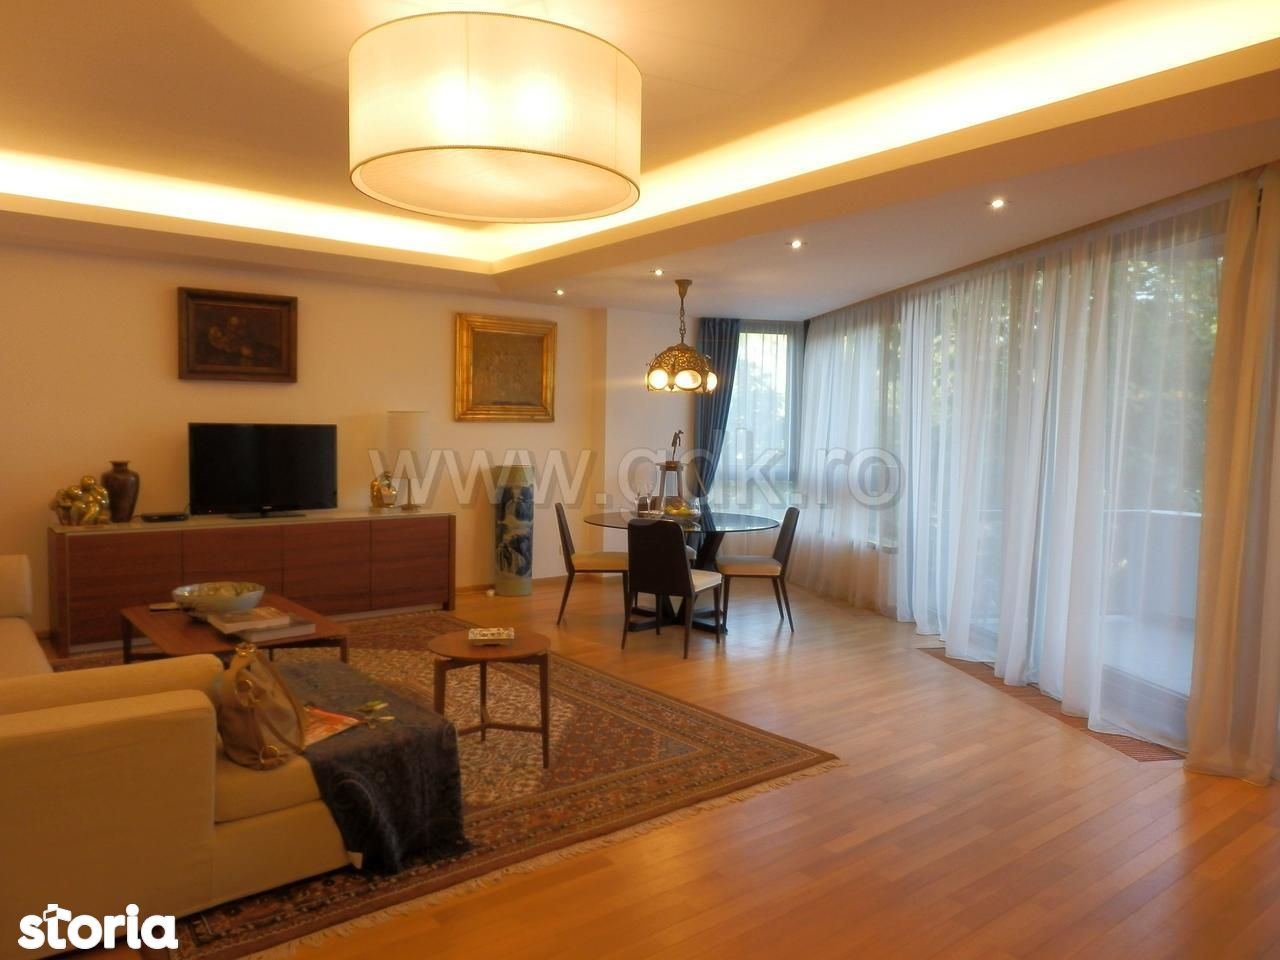 Apartament de inchiriat, București (judet), Strada Gen. Av. Athanasie Enescu - Foto 1